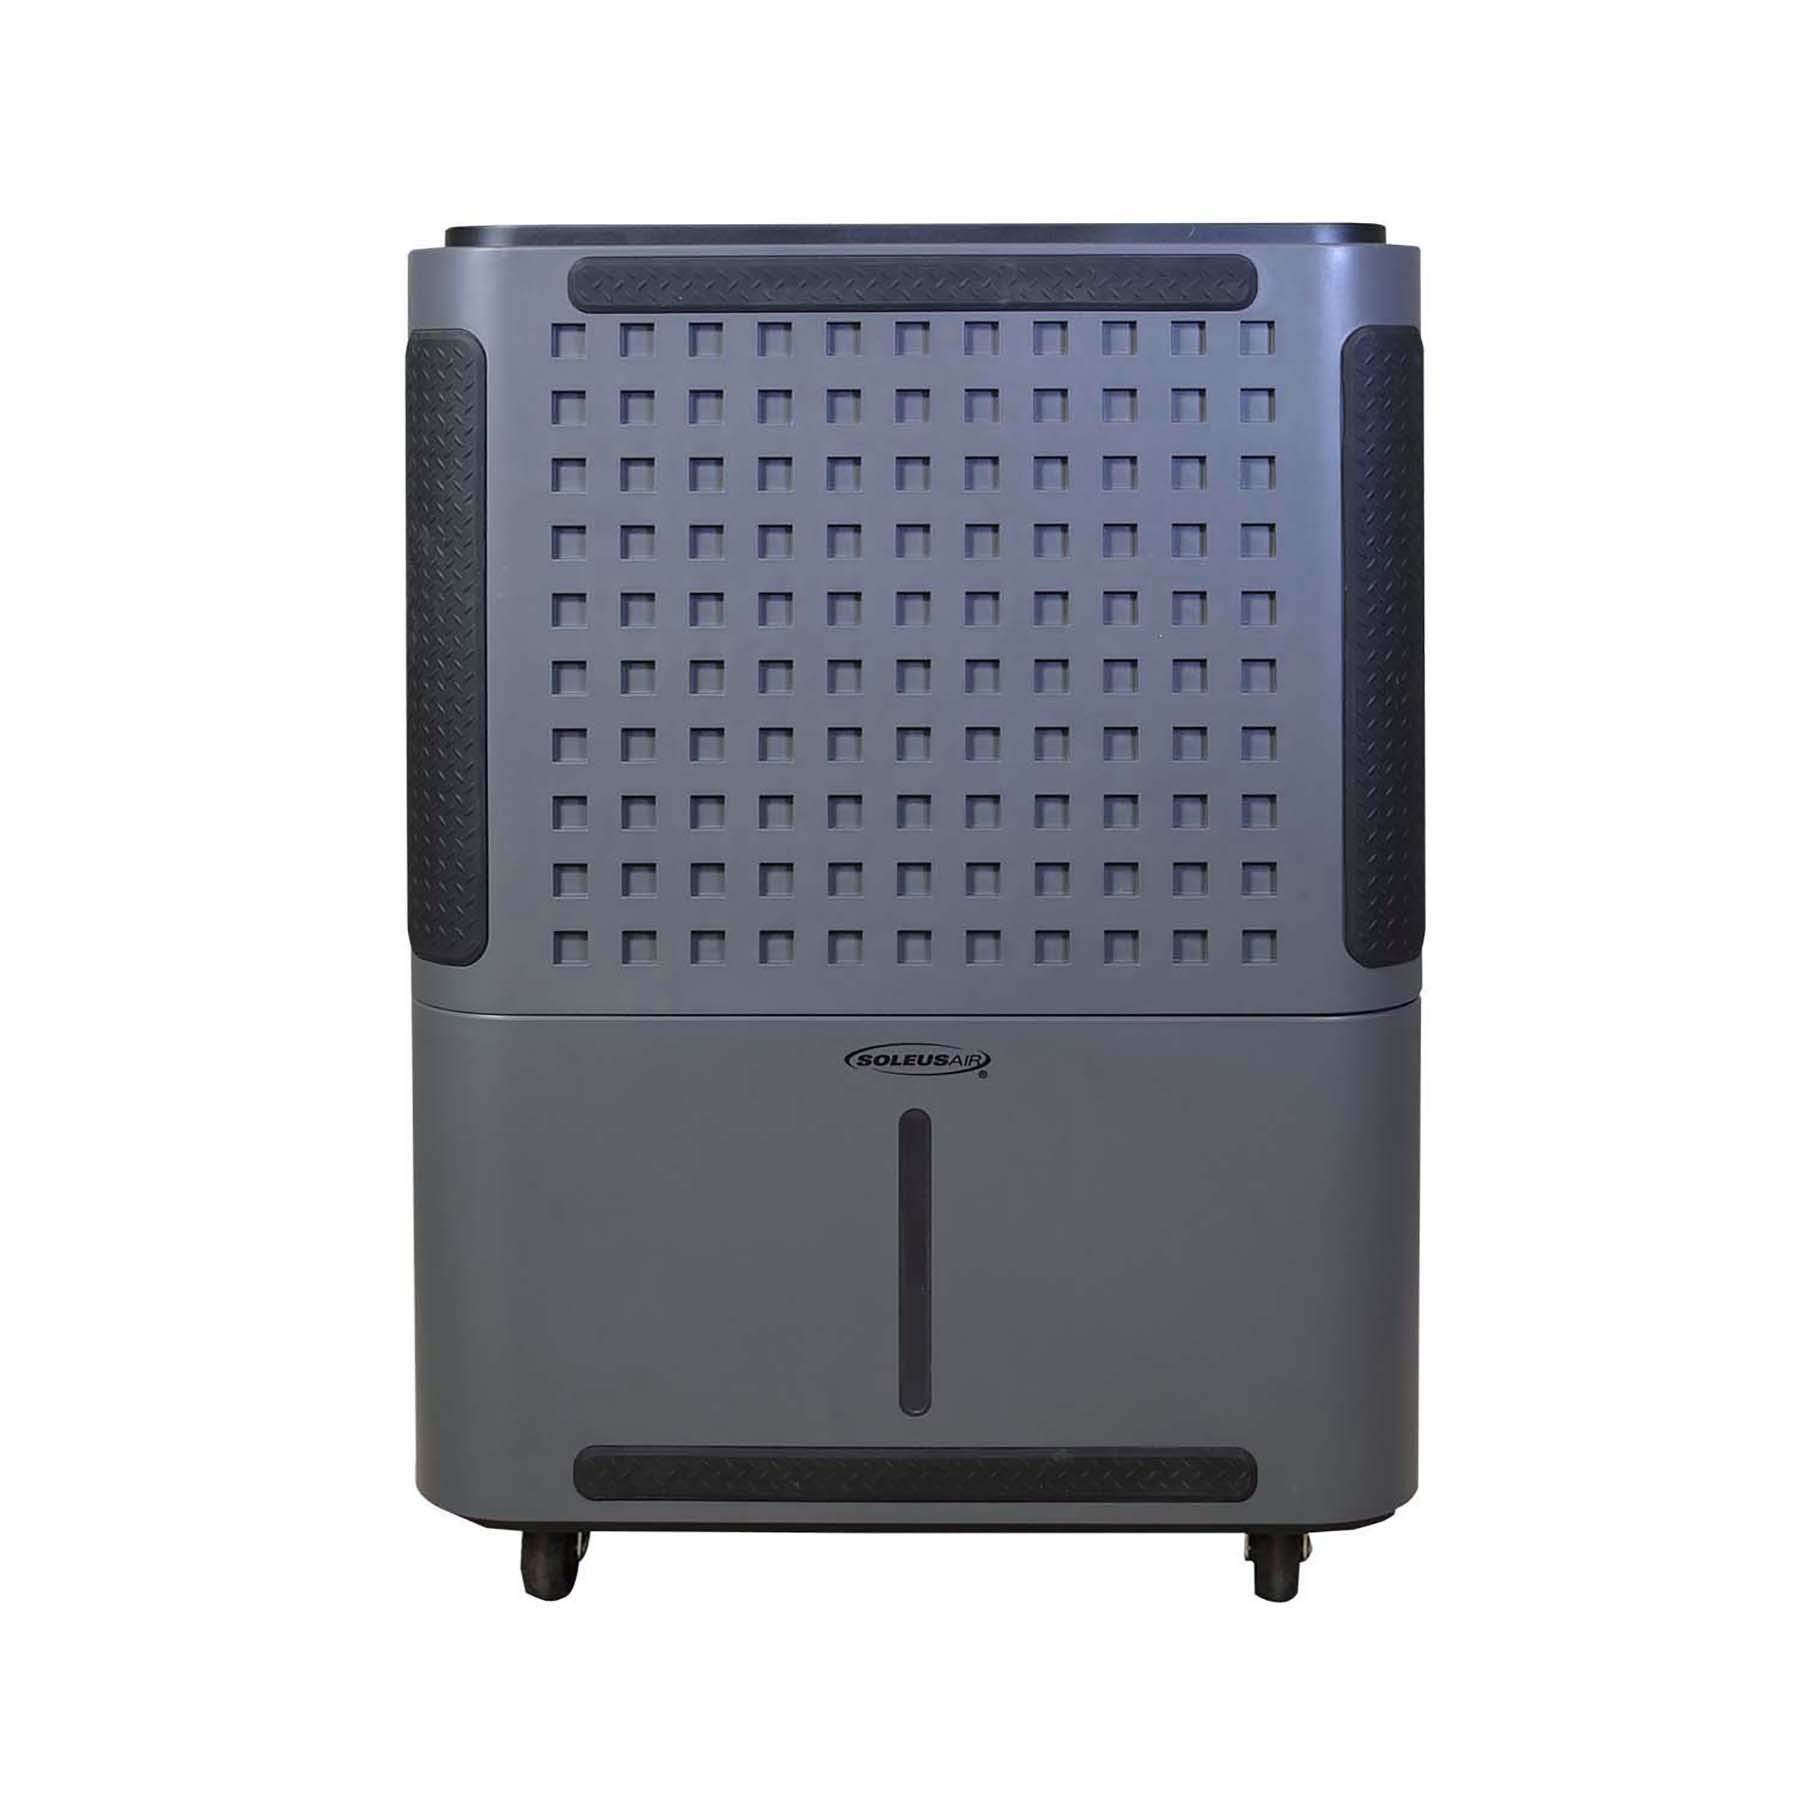 SoleusAir Pint Built Portable Dehumidifier